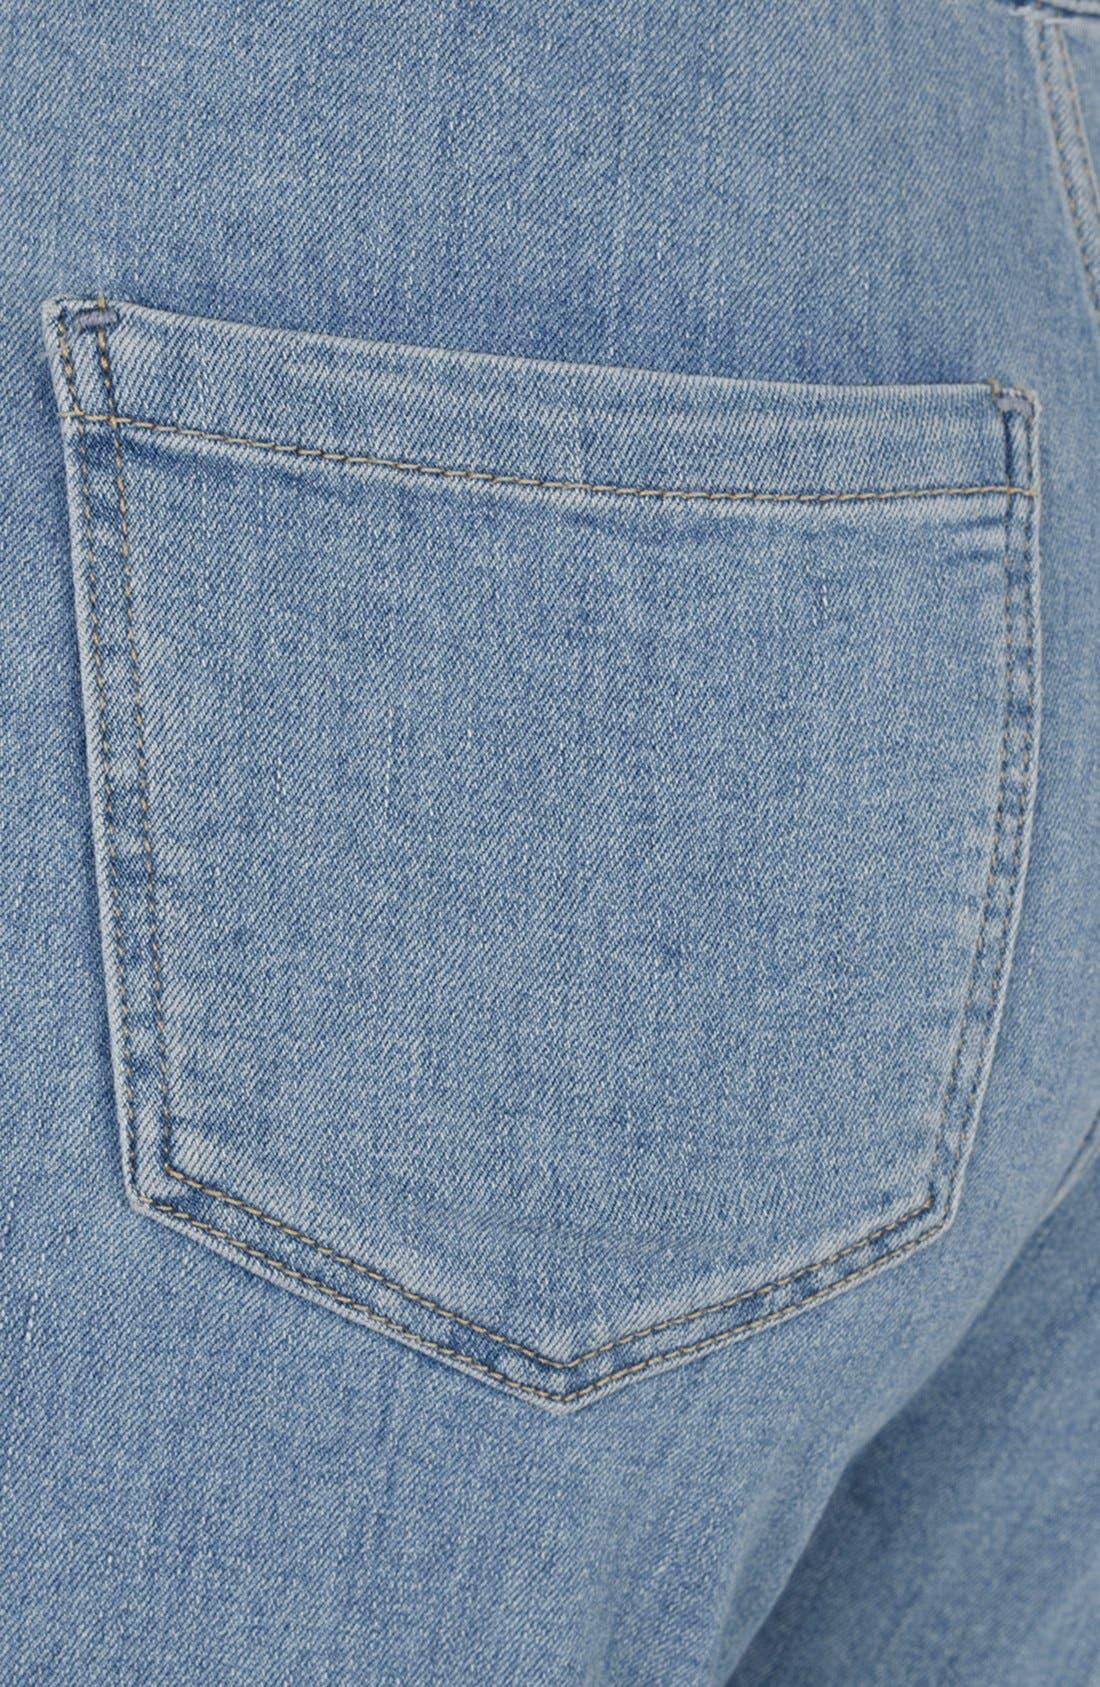 Alternate Image 3  - Topshop Moto 'Joni' High Rise Skinny Jeans (Mid Stone)